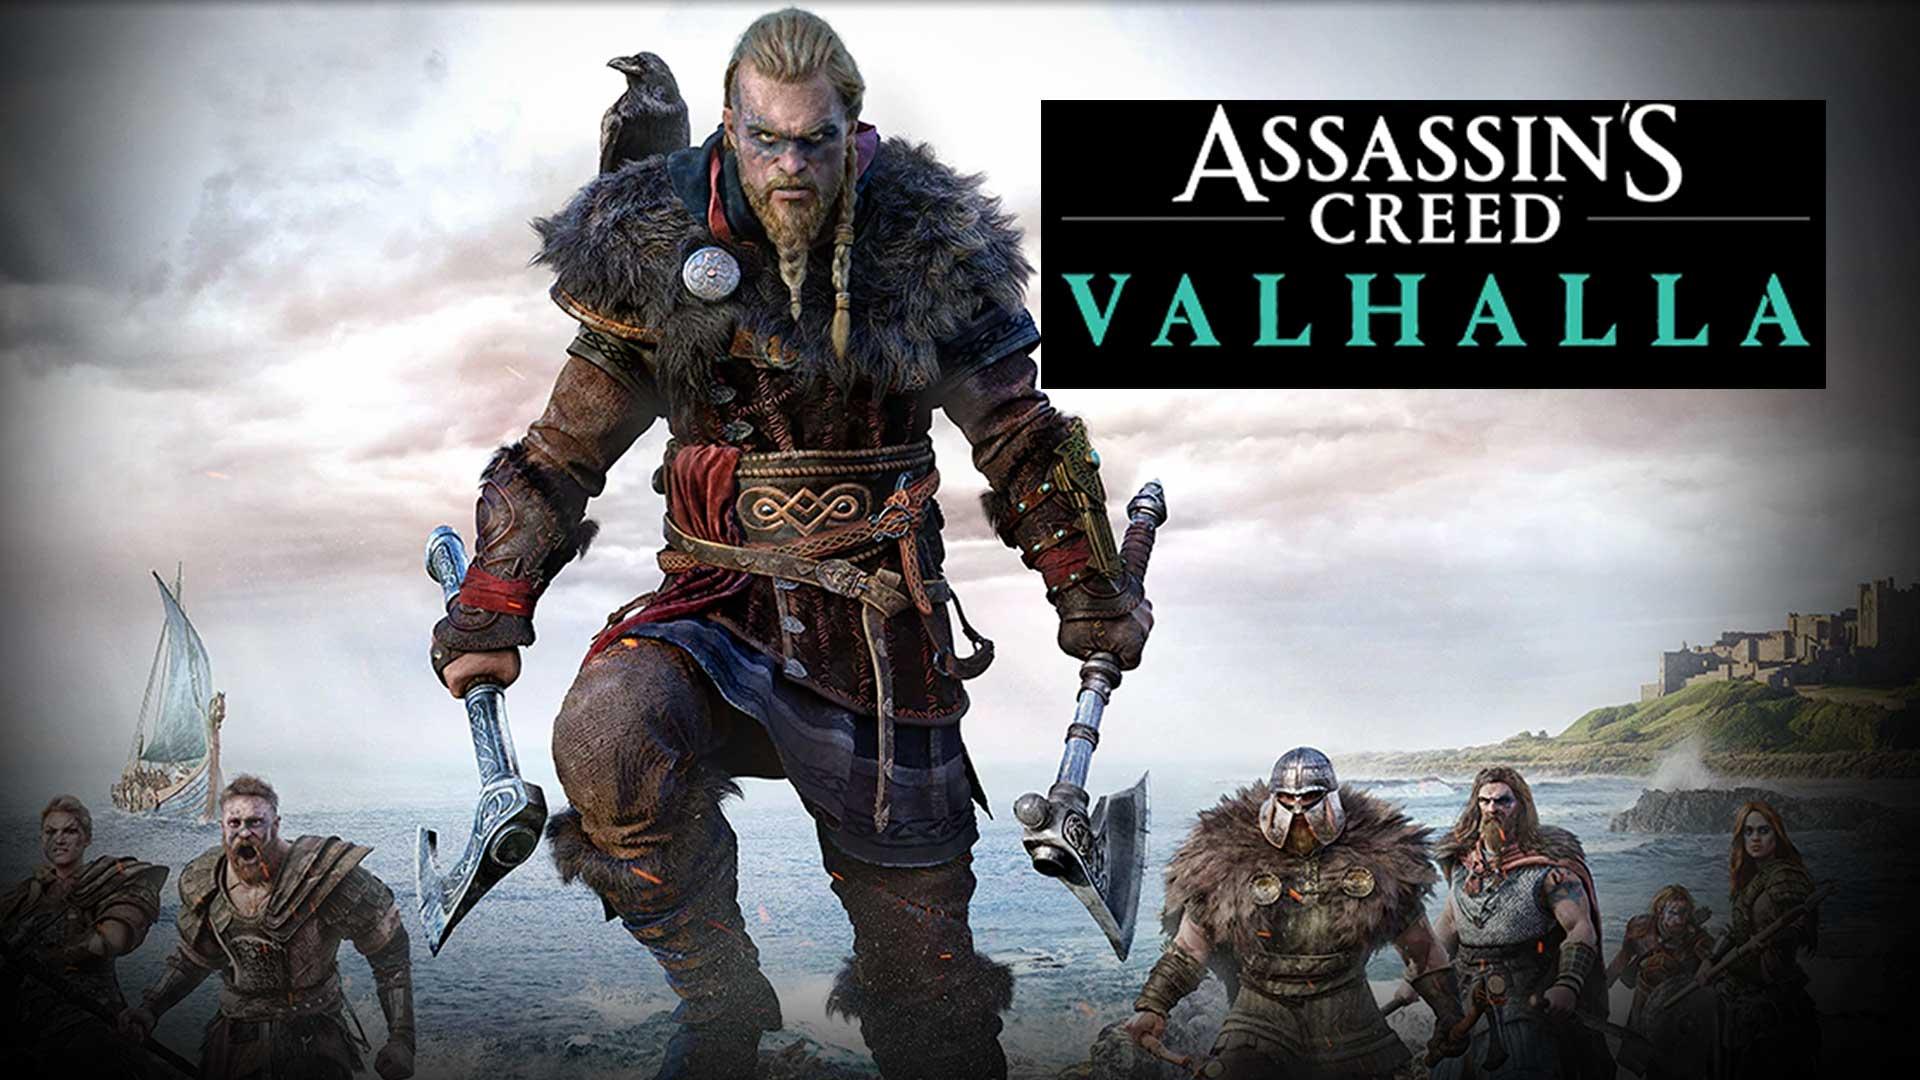 assassins creed valhalla release